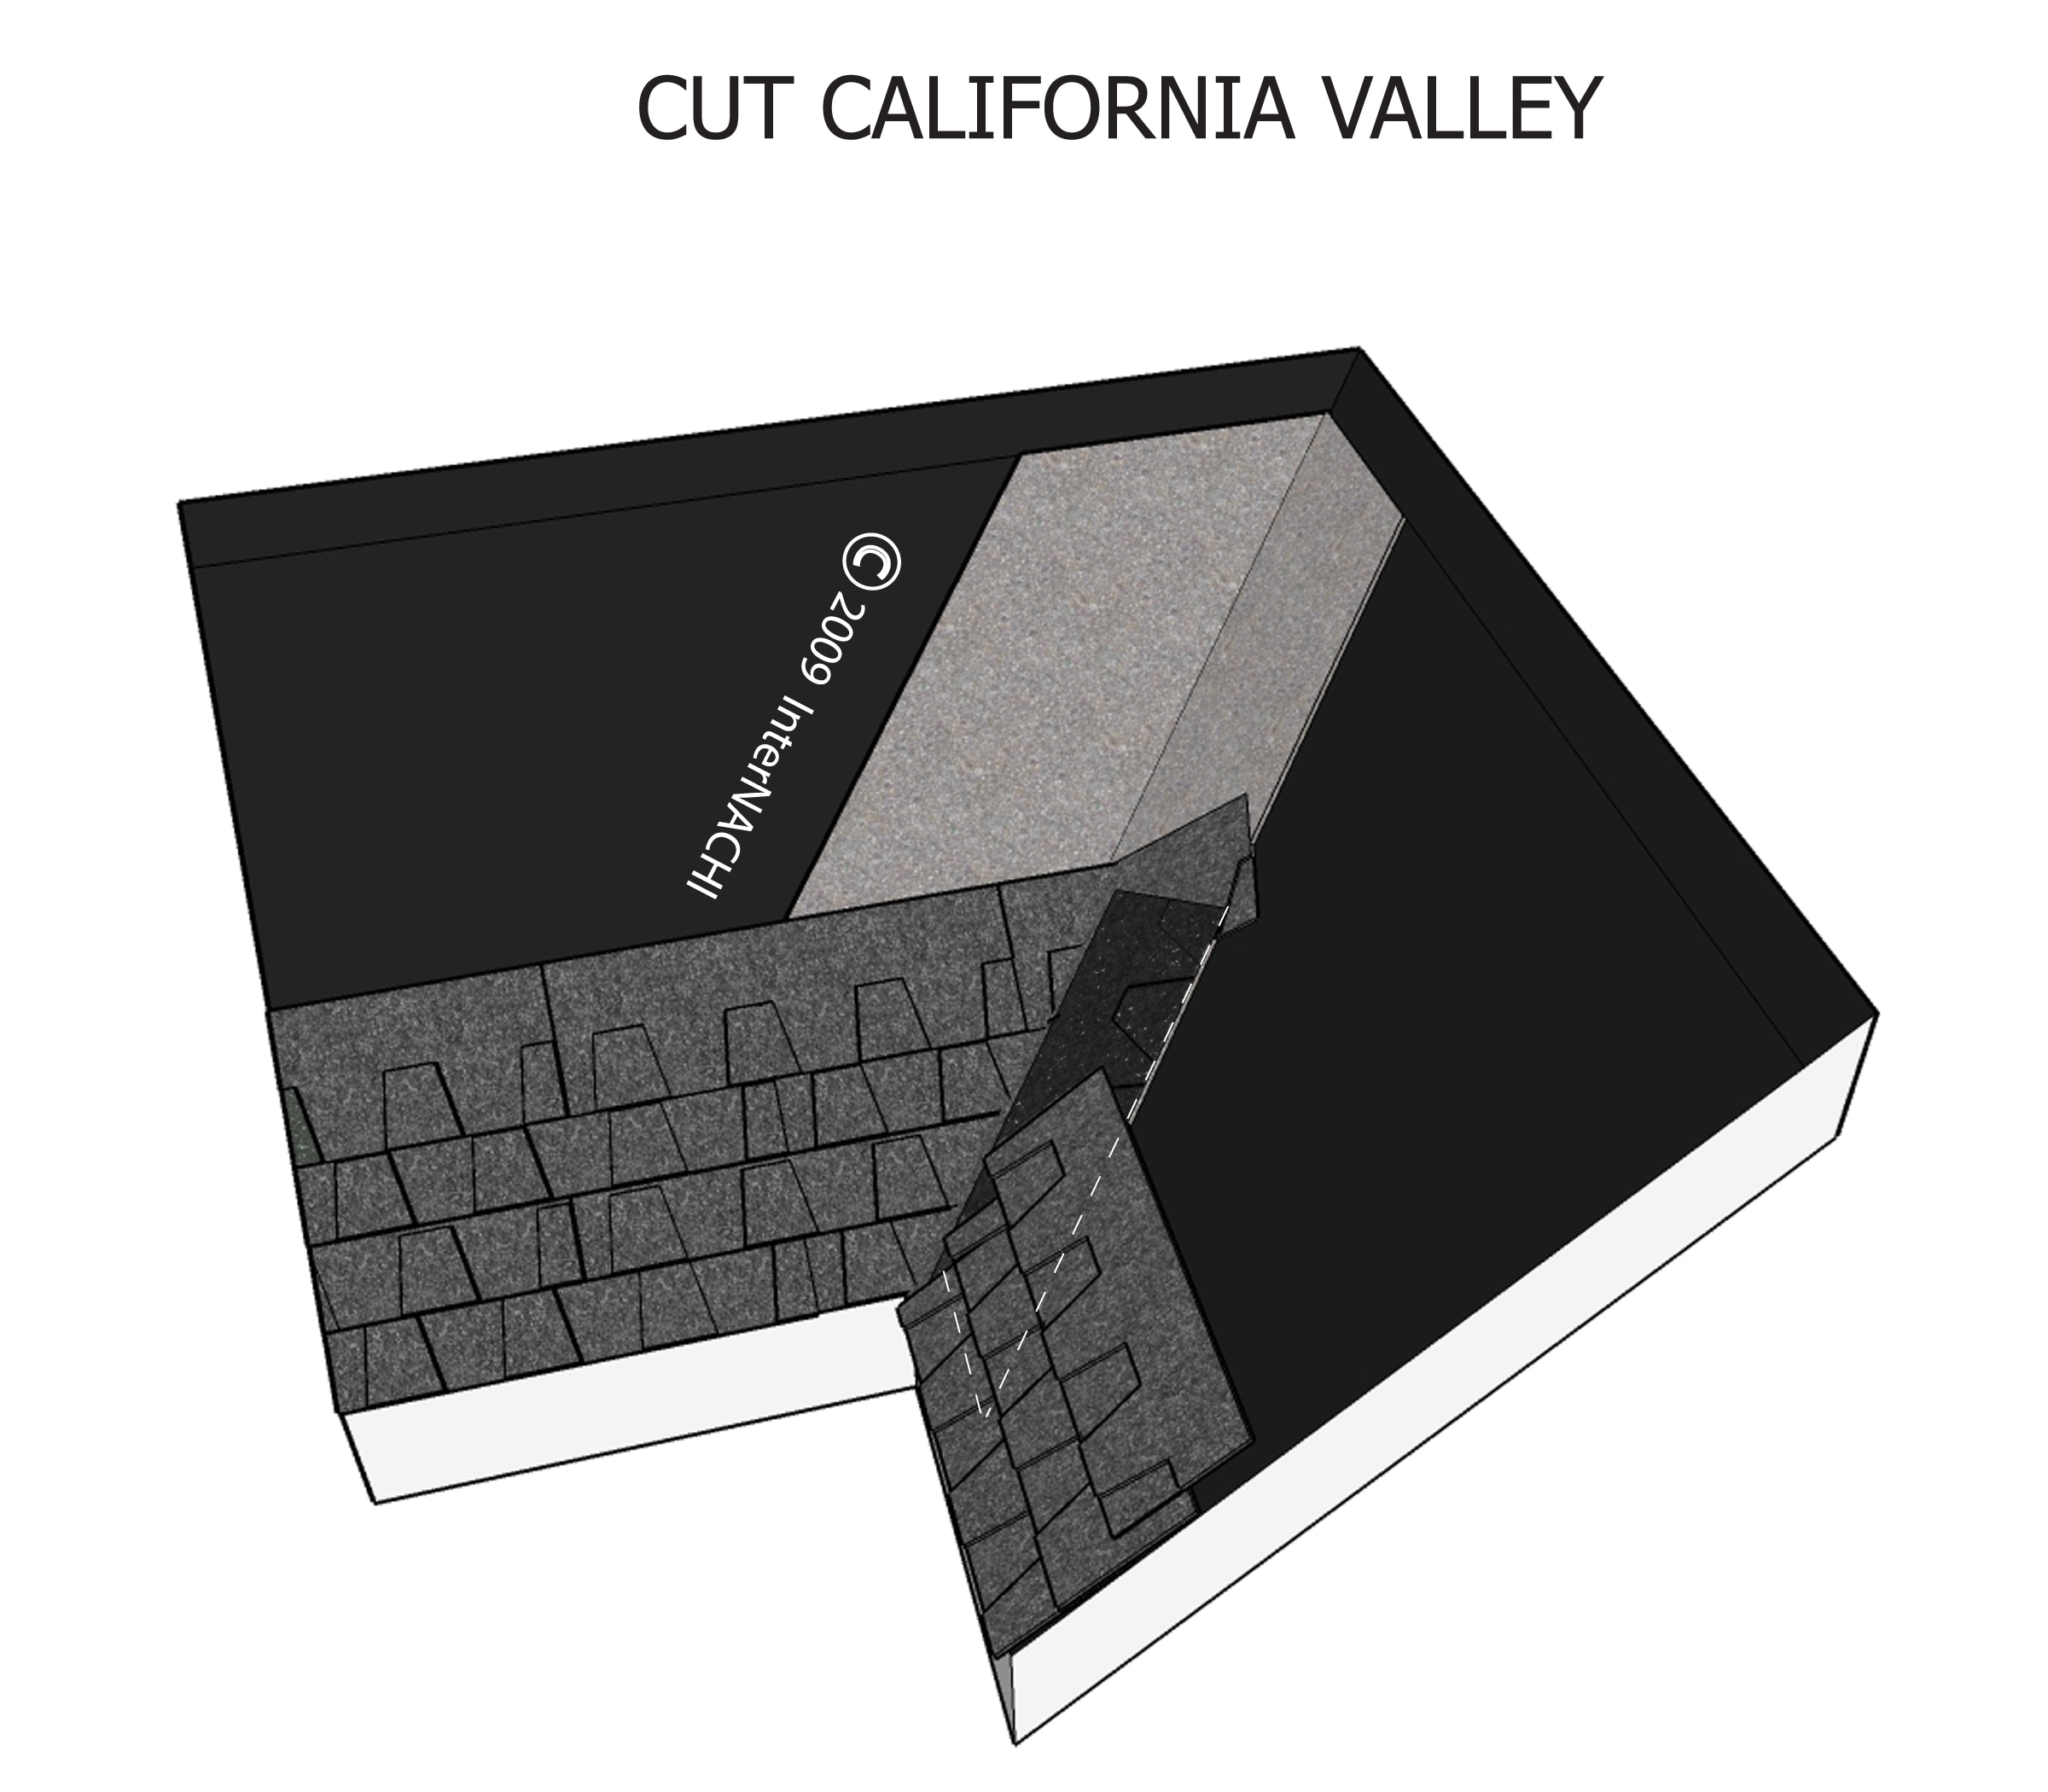 Cut California valley.